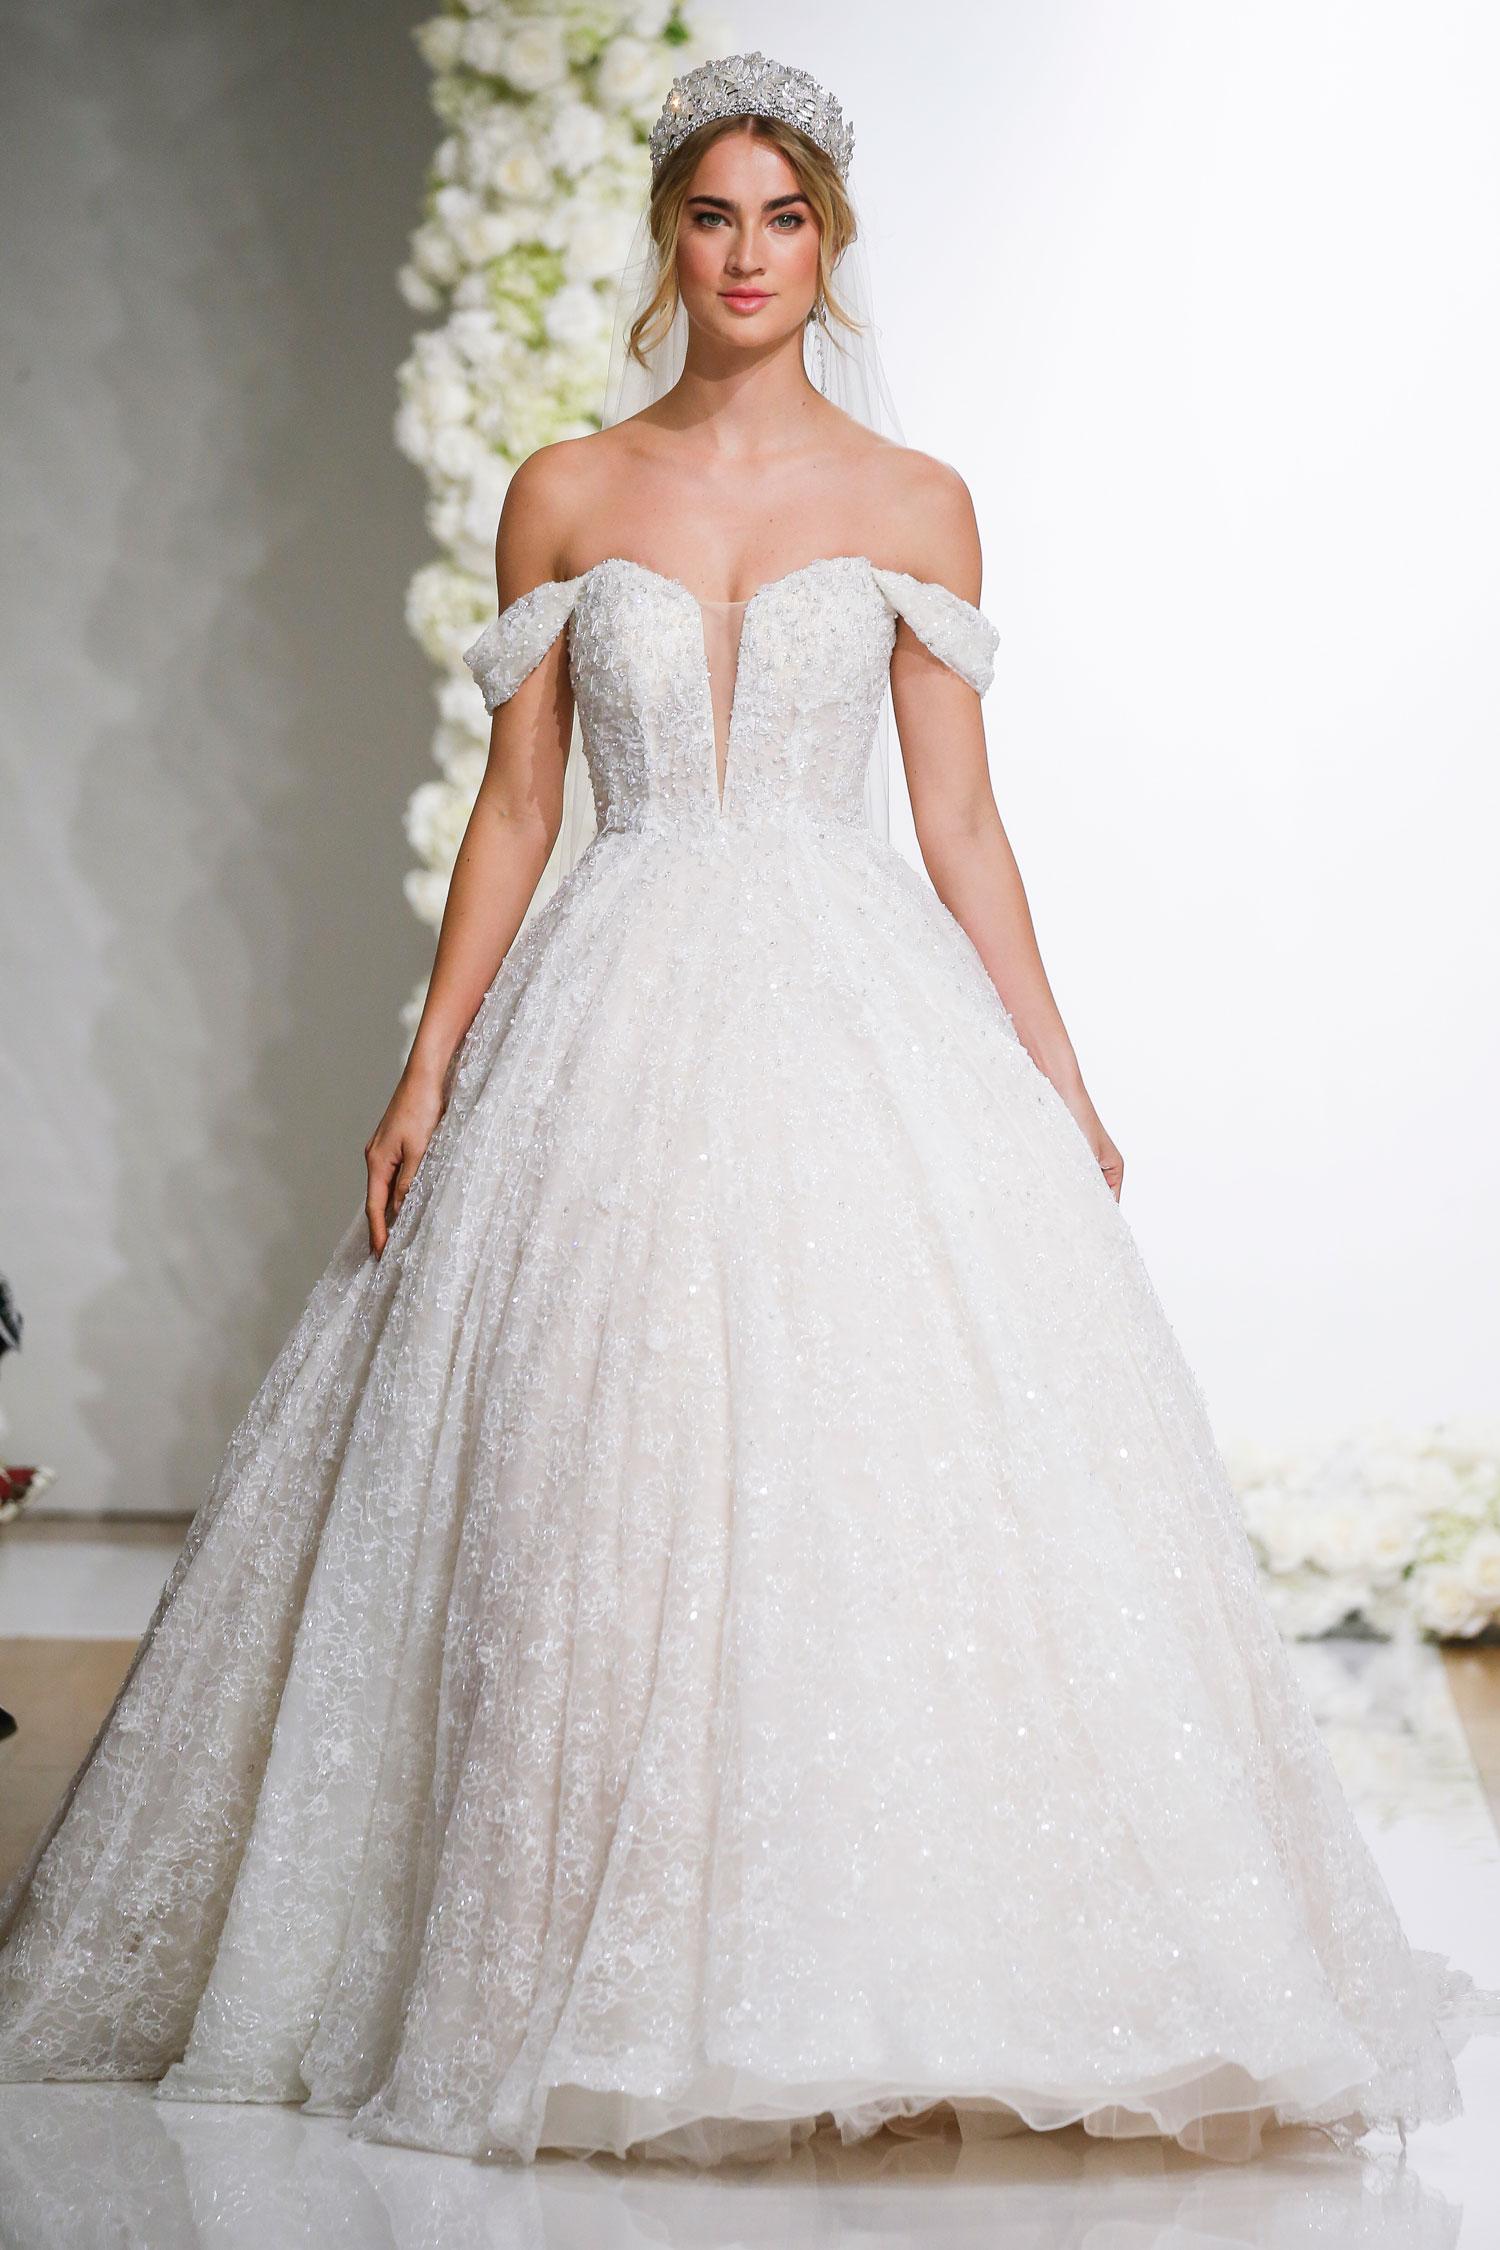 f6e50eaa39ce Morilee by Madeline Gardner off shoulder ball gown royal wedding inspired  dresses